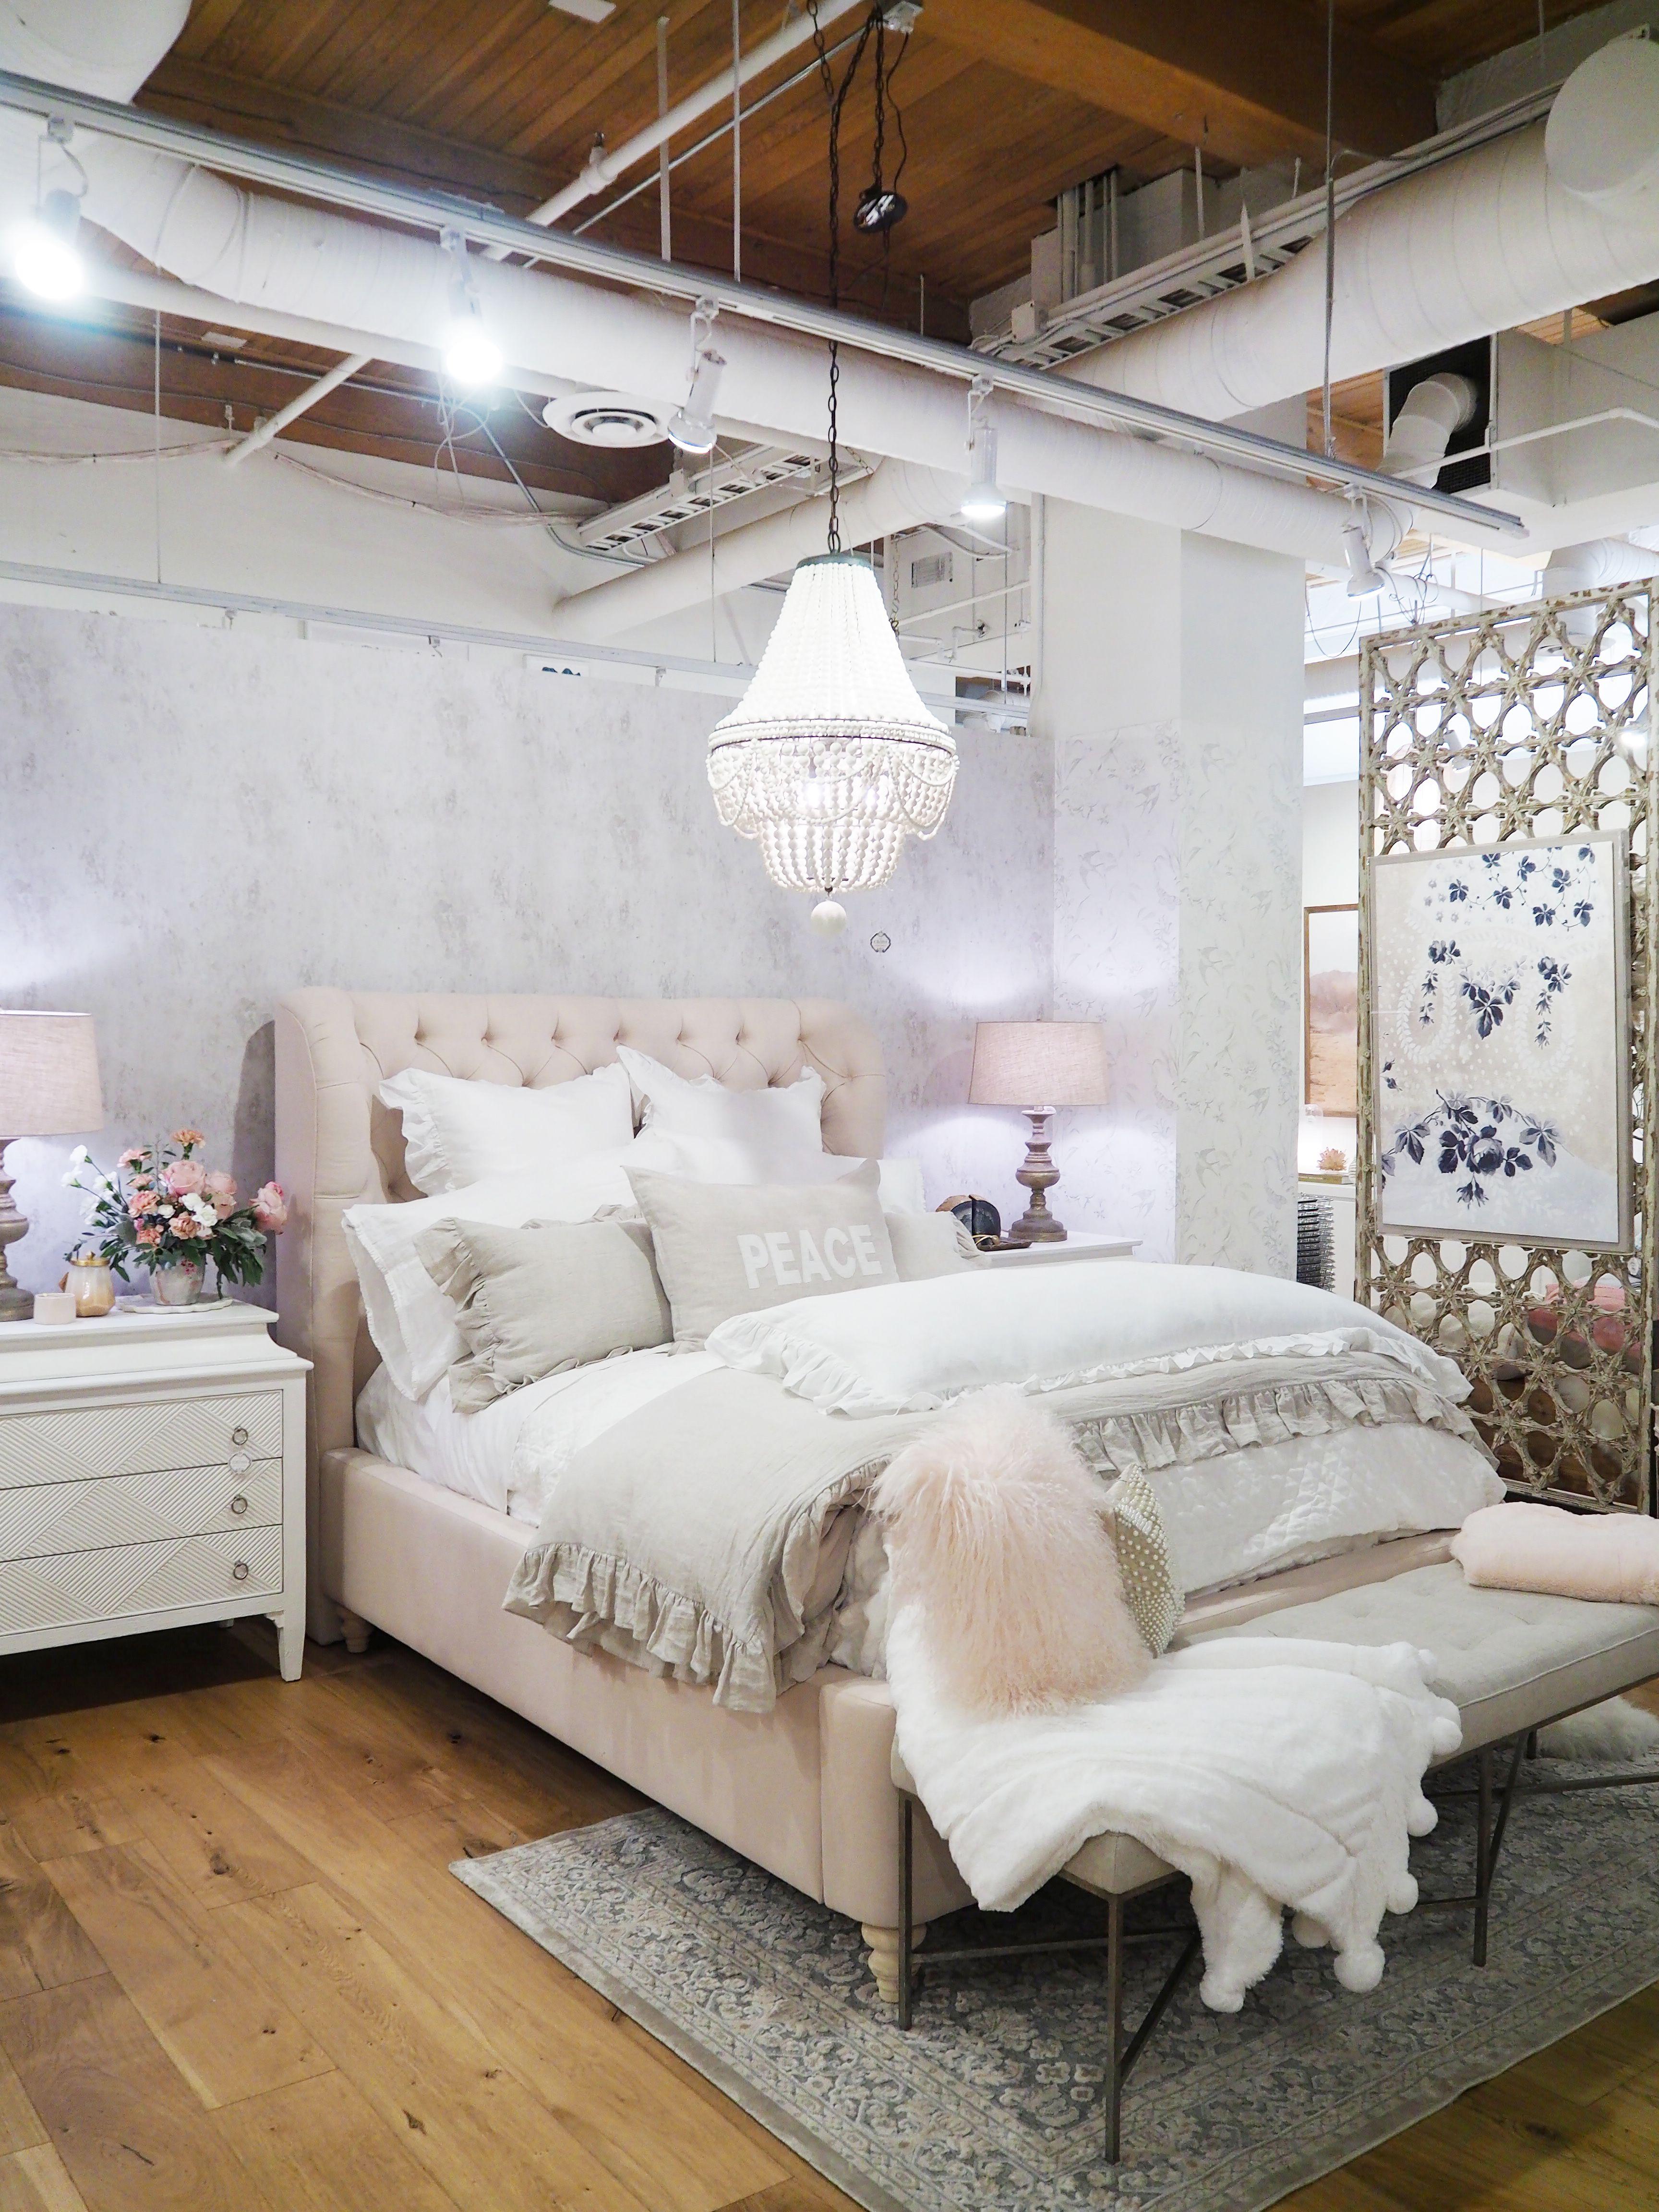 Jillianharris Bedding Home Decor Style Cozy Chandelier